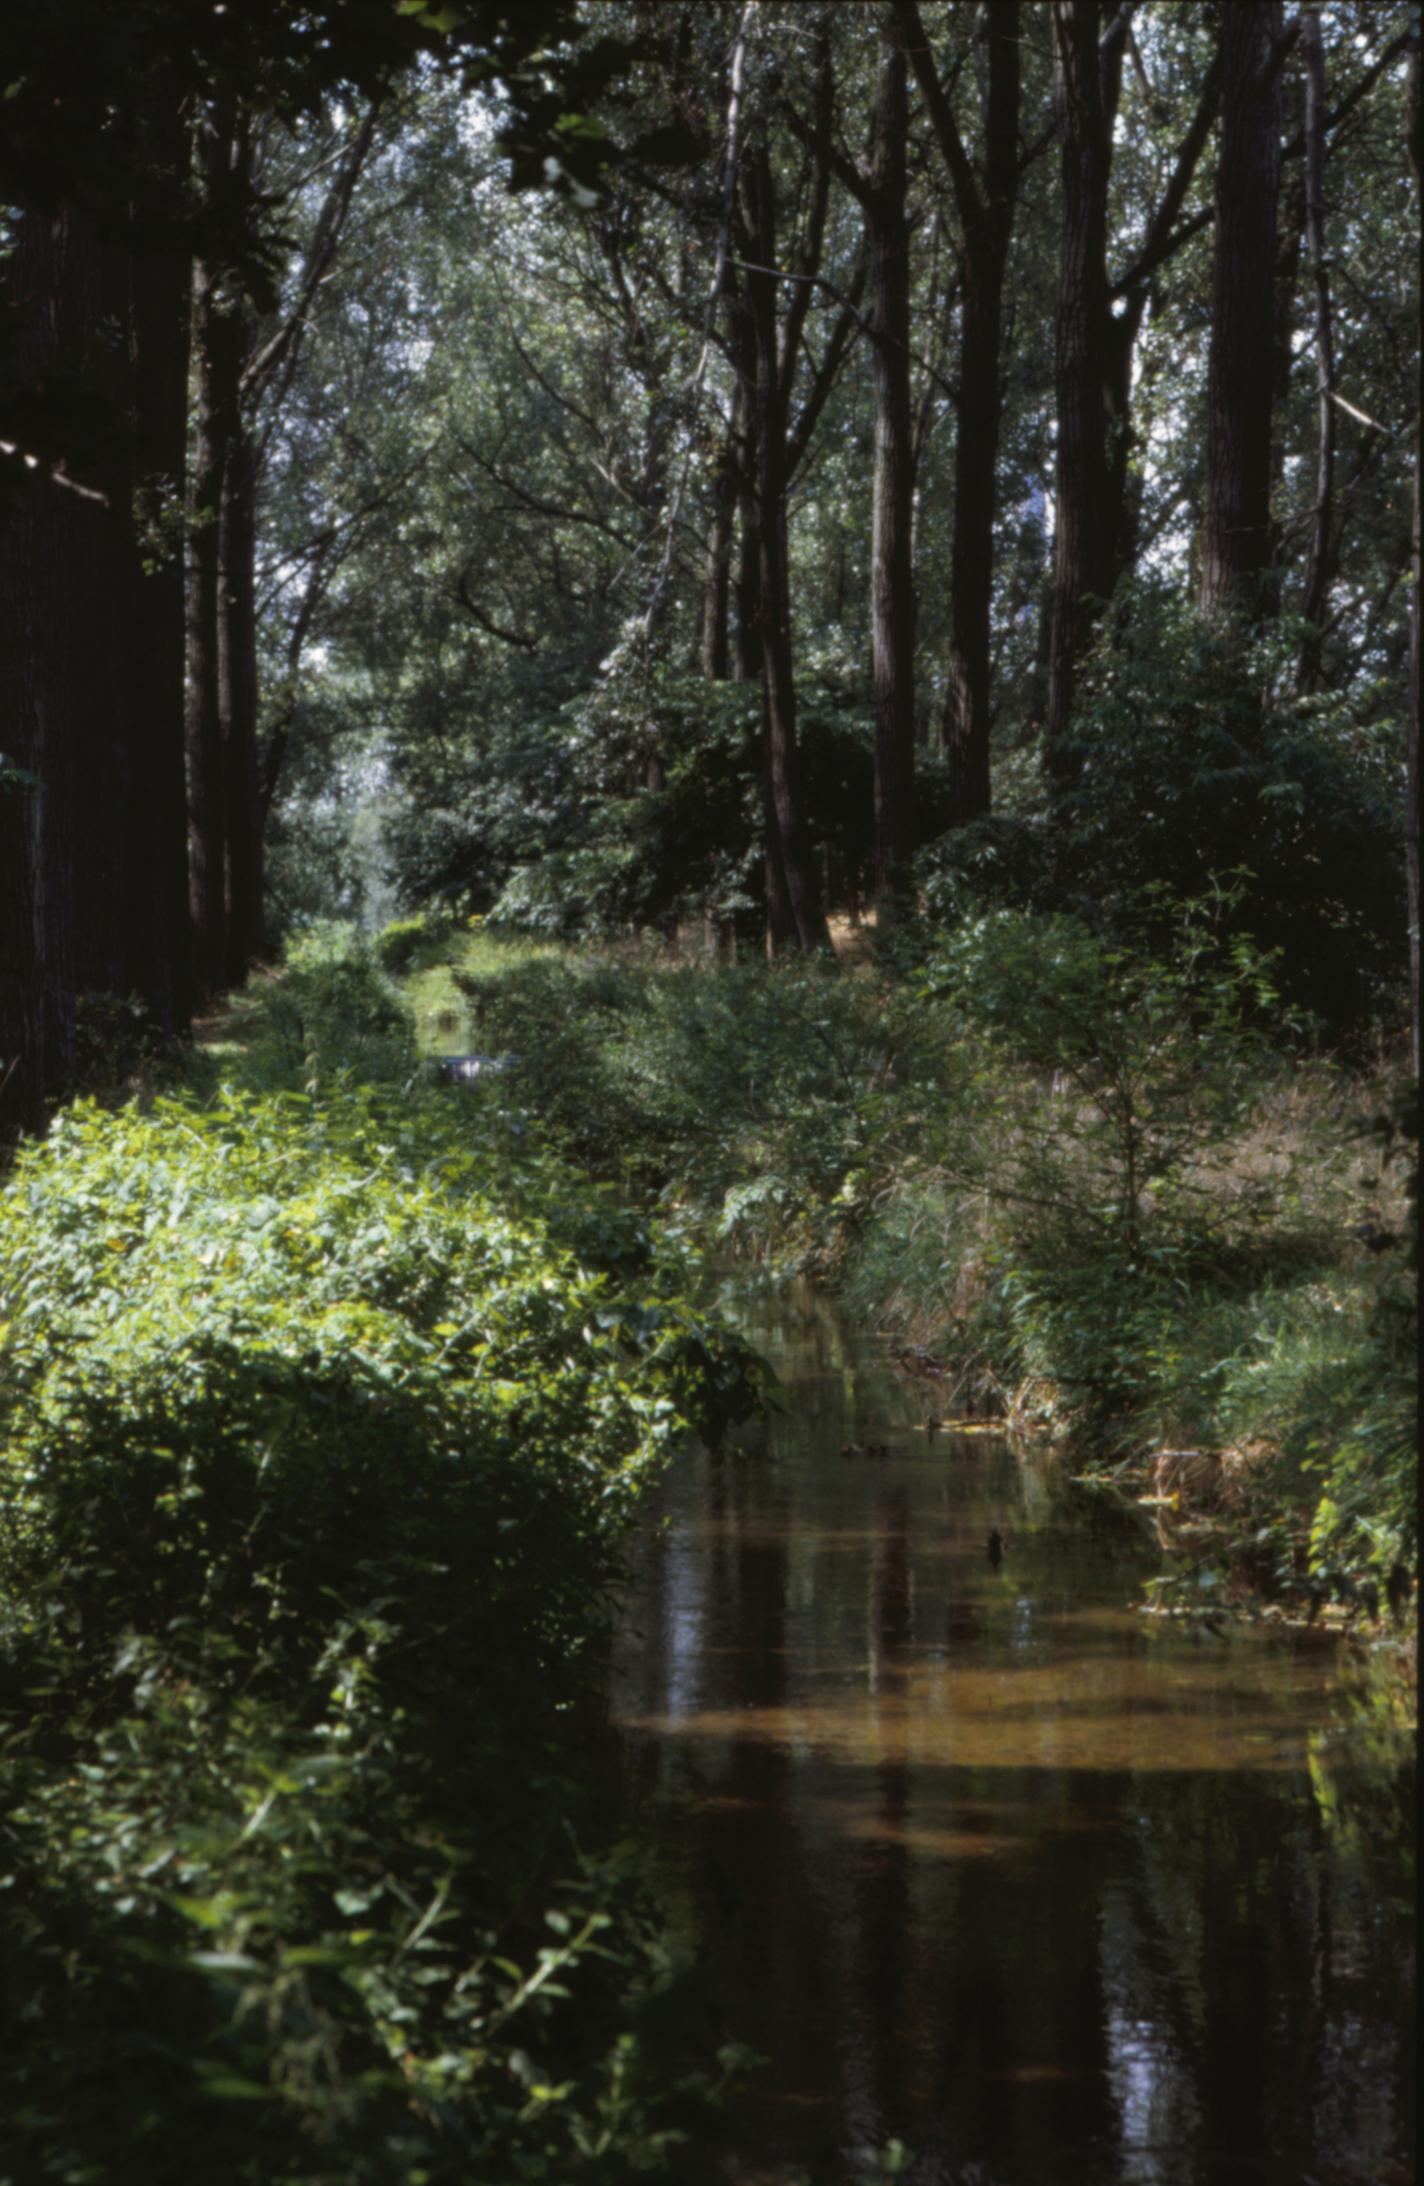 Forest landscape, Forest, Green, Landscape, Nature, HQ Photo